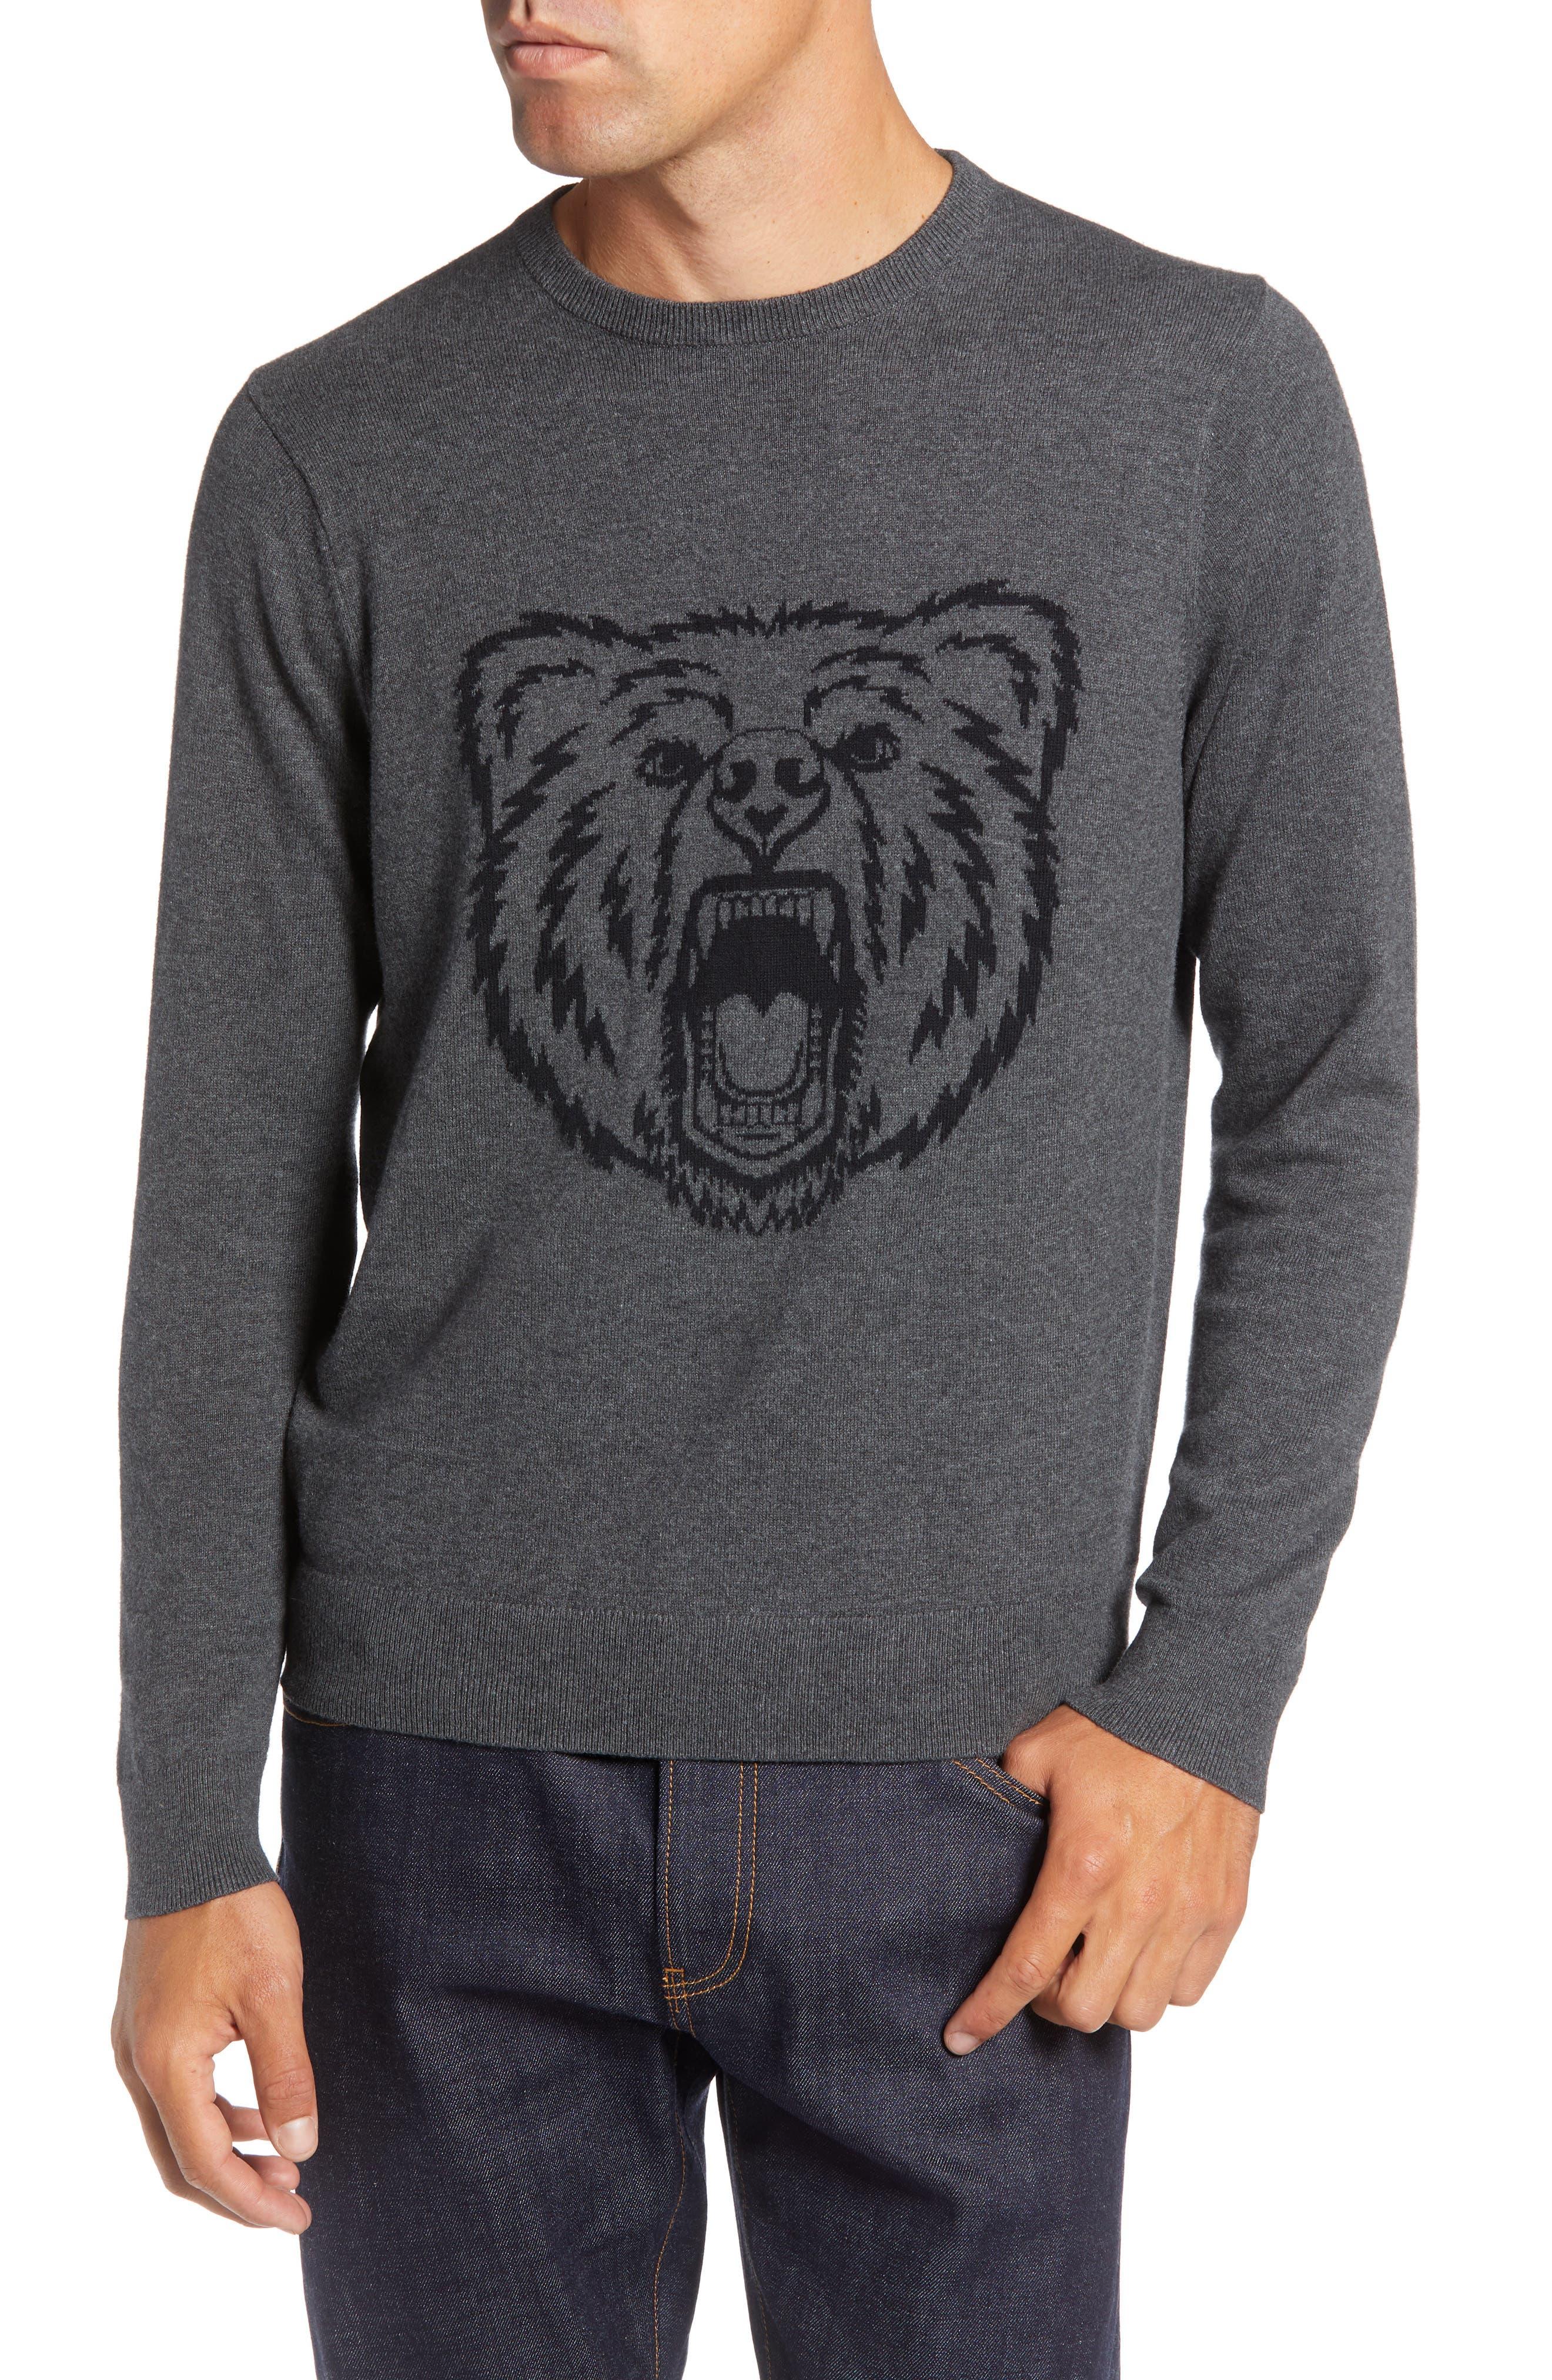 Bear Crewneck Sweater,                         Main,                         color, GREY CASTLEROCK MARL BEAR